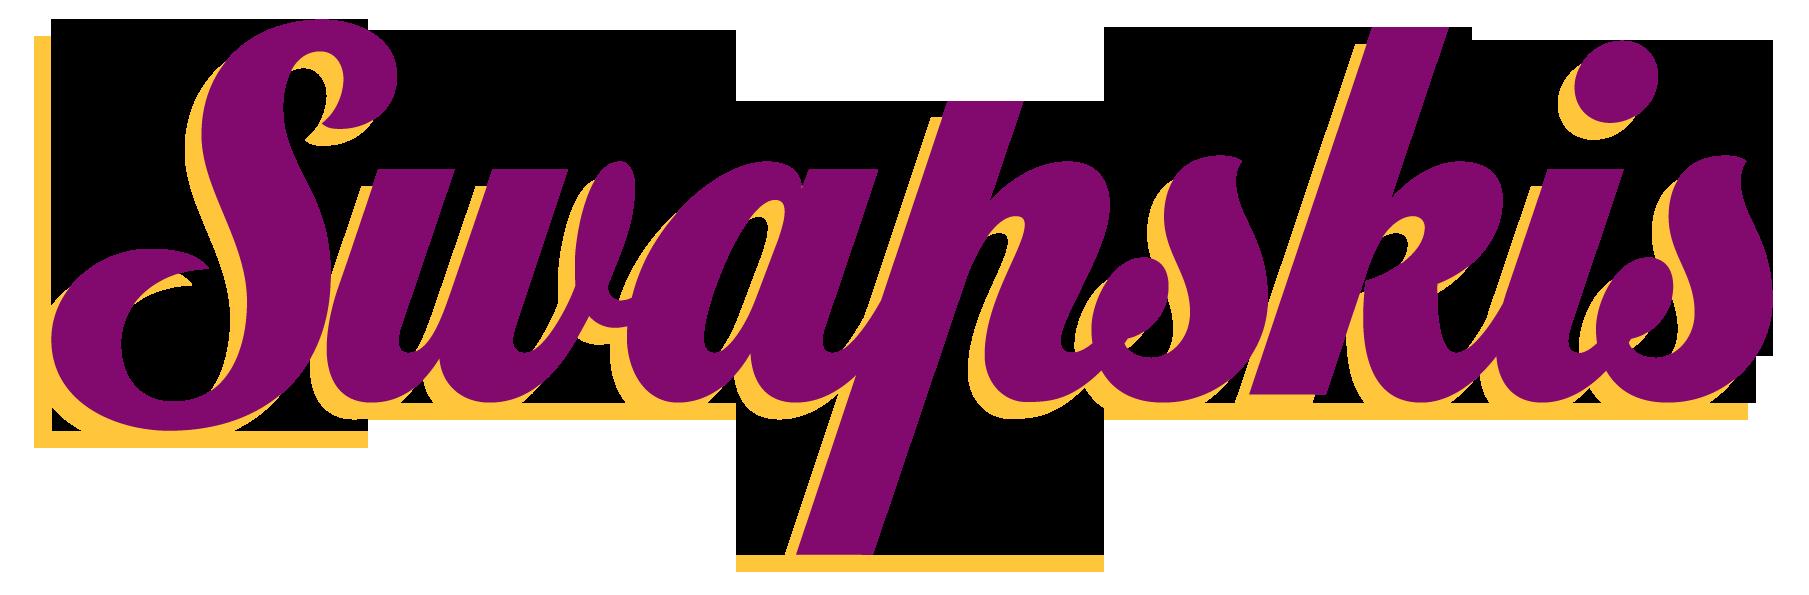 Swapskis-Logocolor